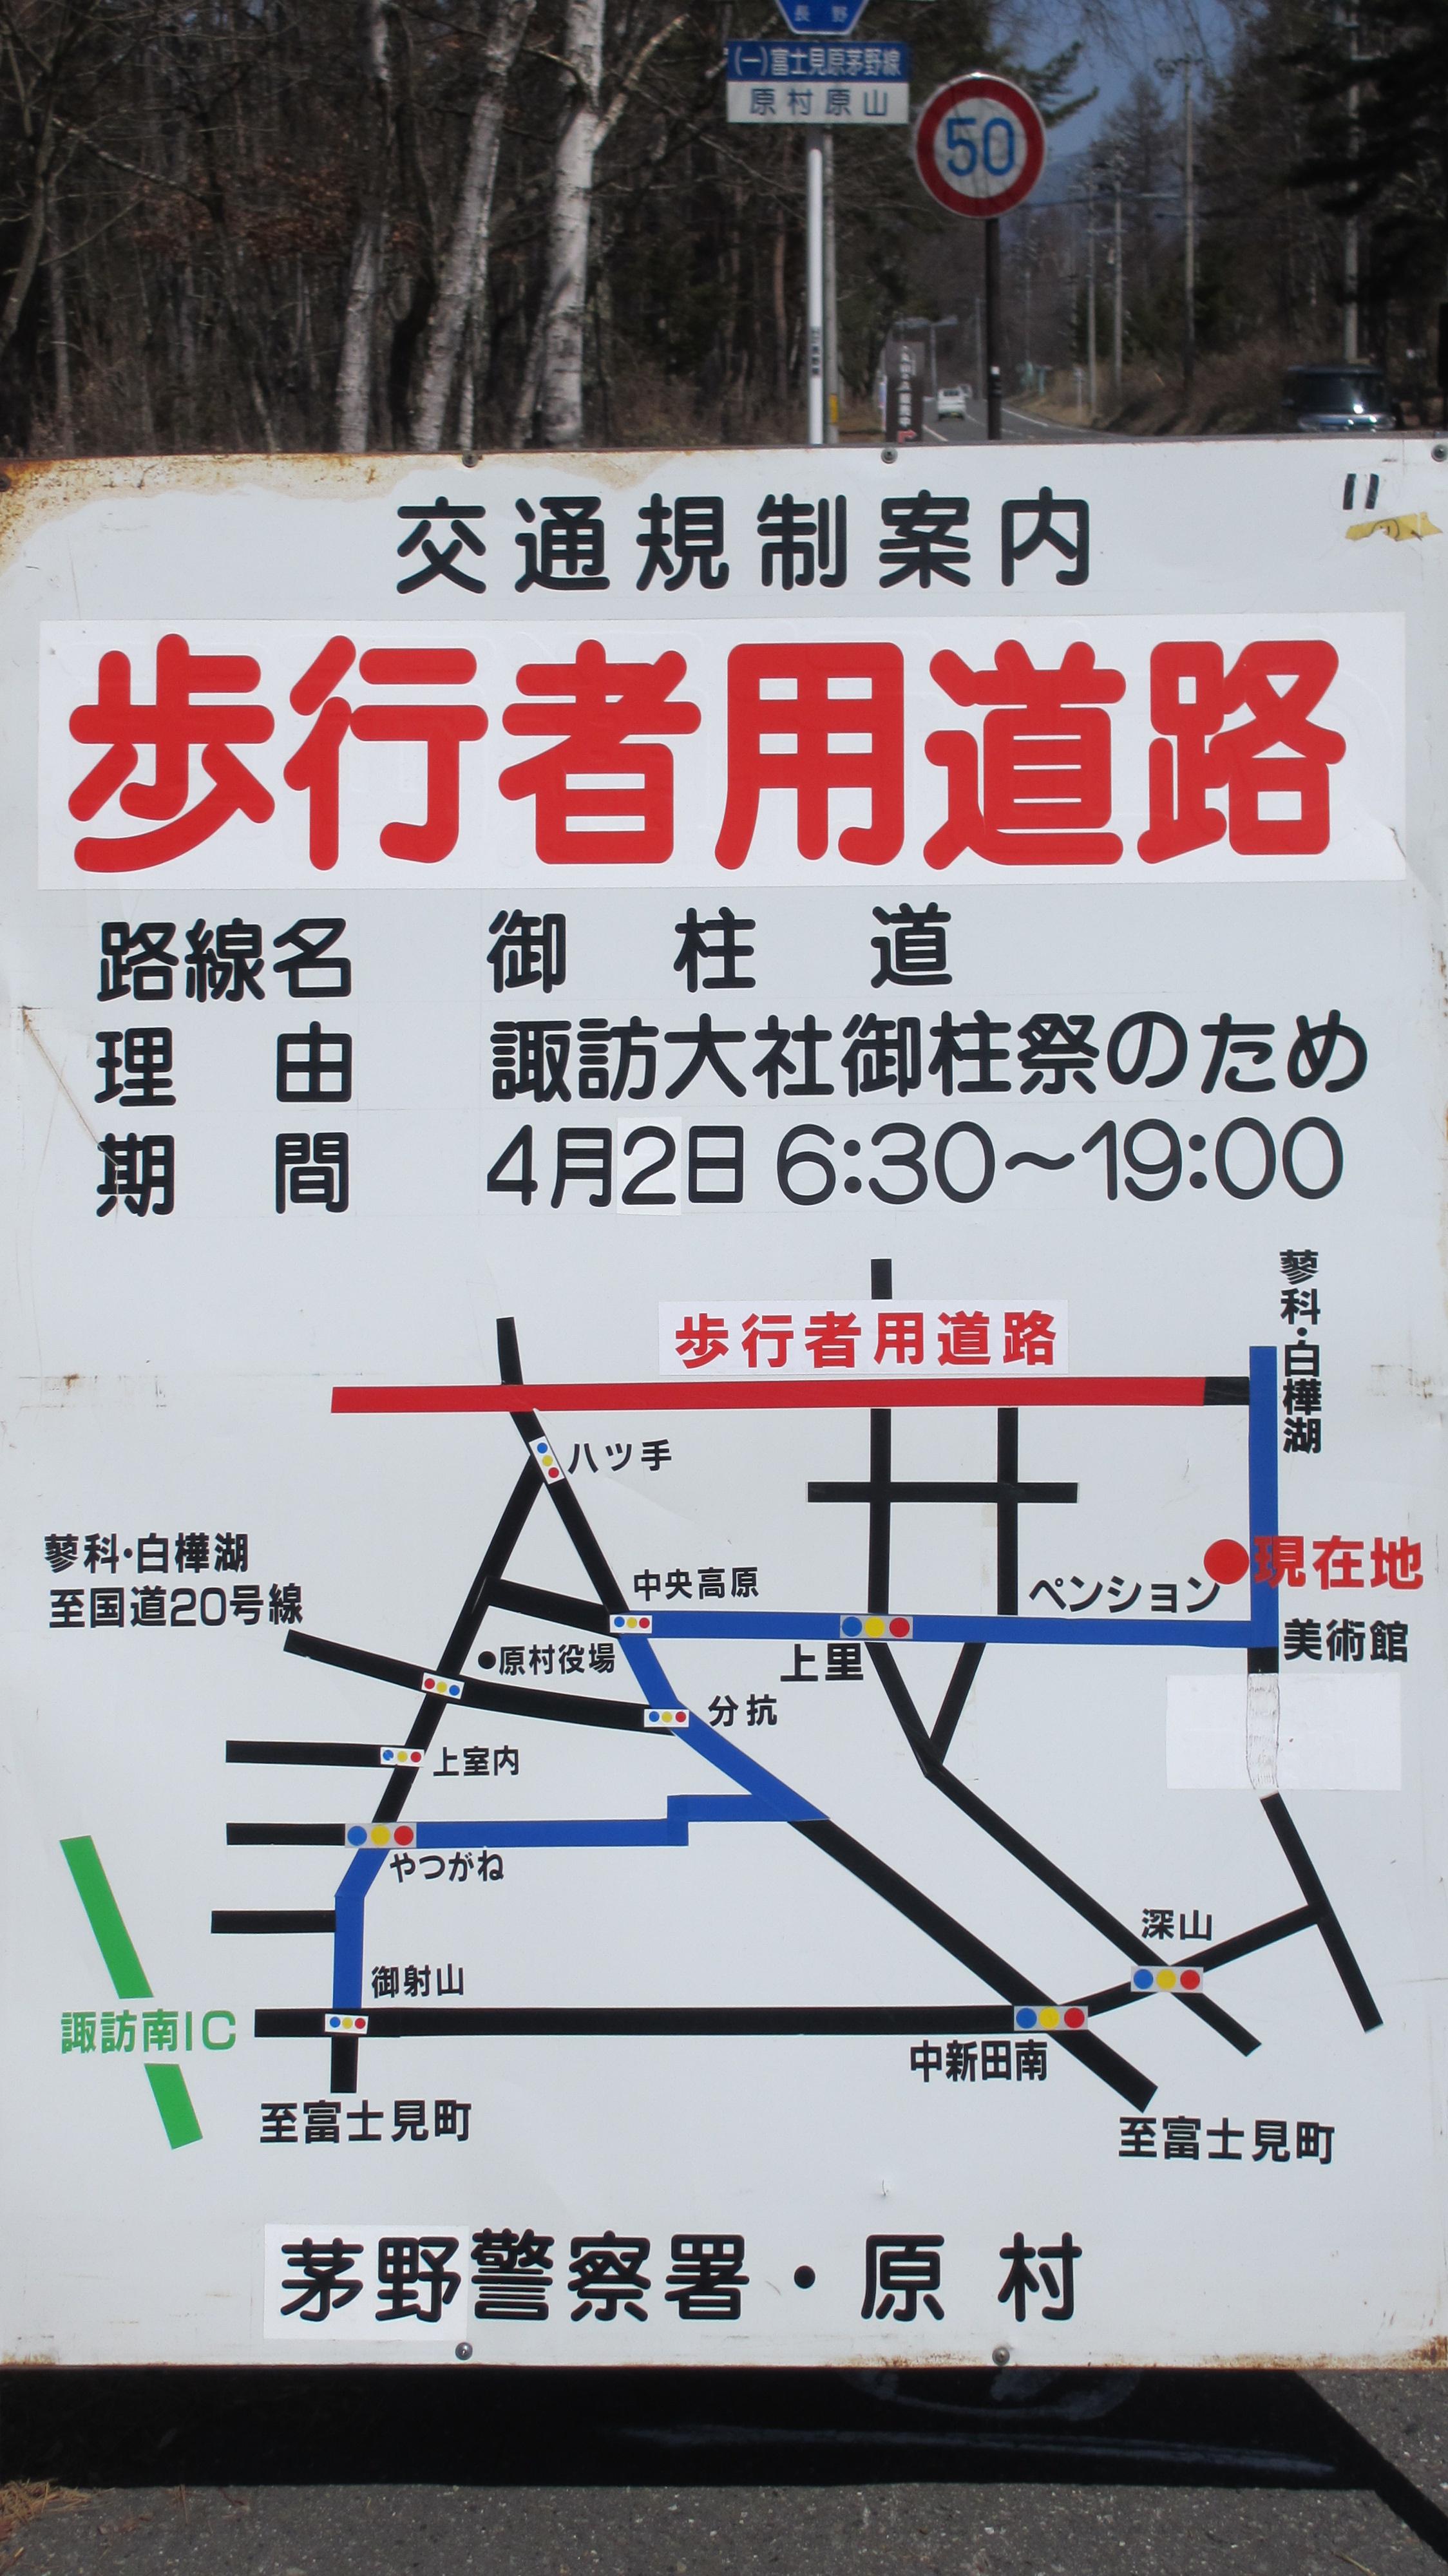 http://www.alpico.co.jp/shikinomori/news/images/IMG_5725.JPG